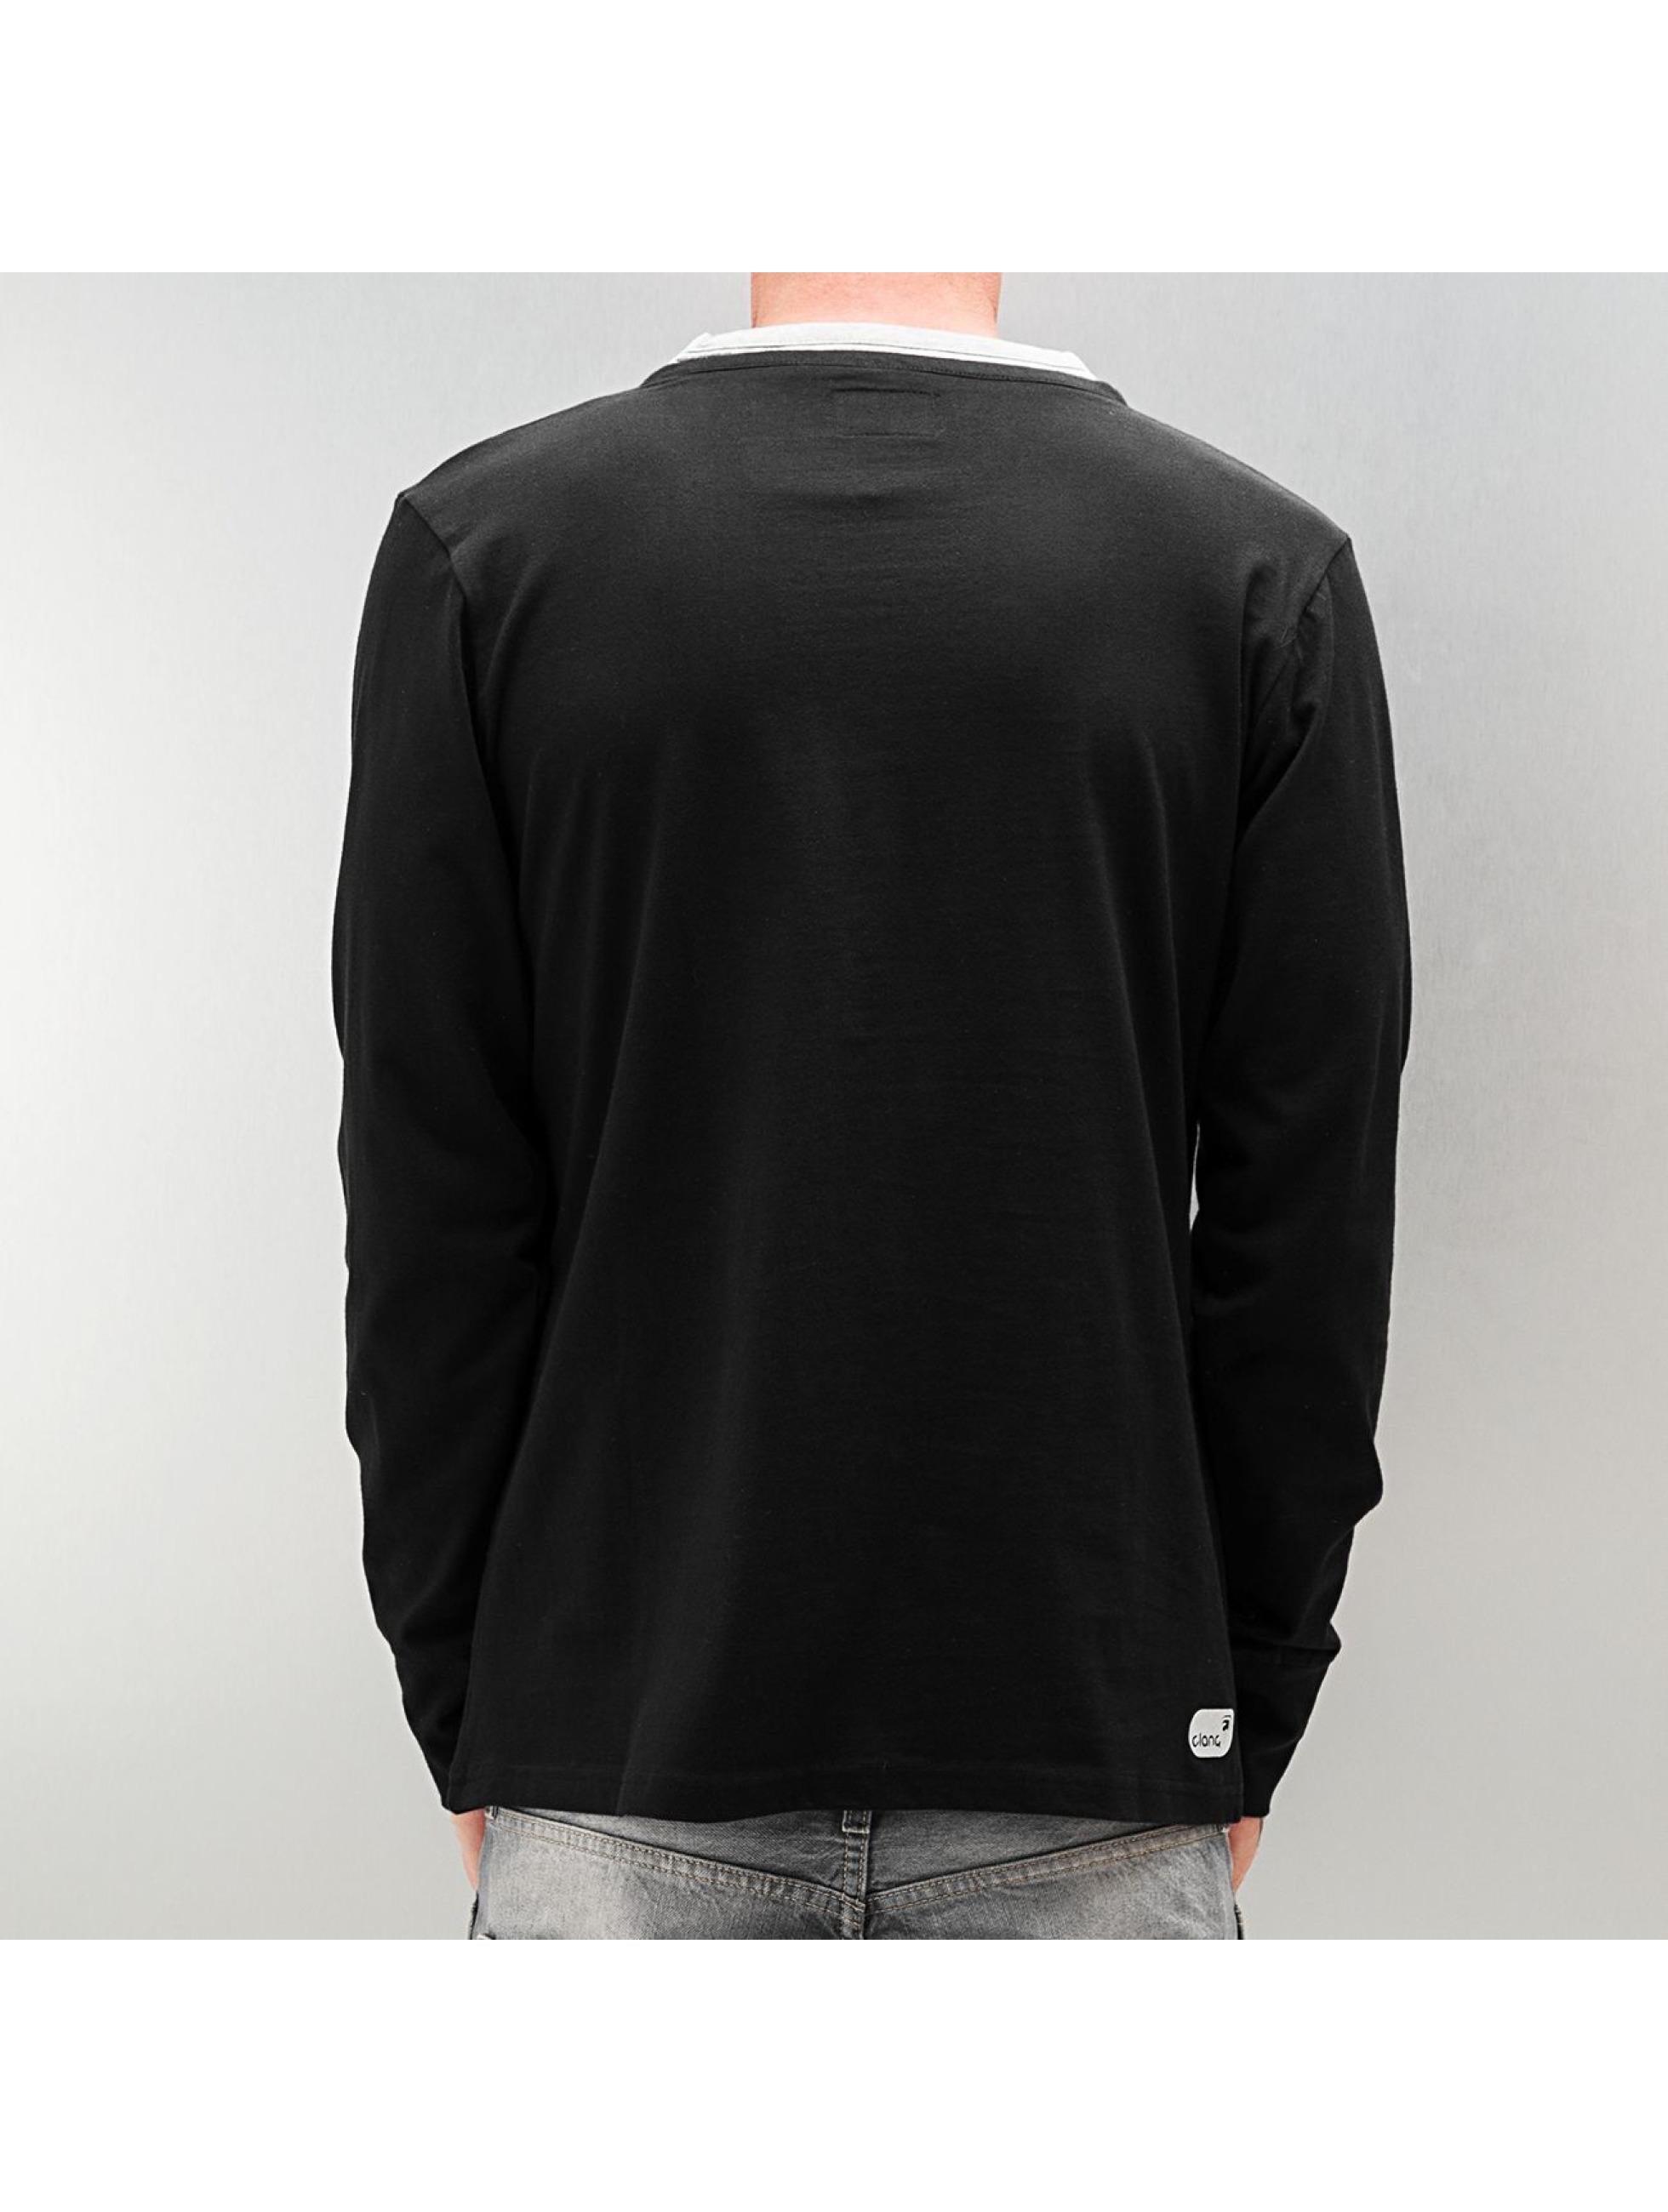 Clang Pitkähihaiset paidat Kianu musta